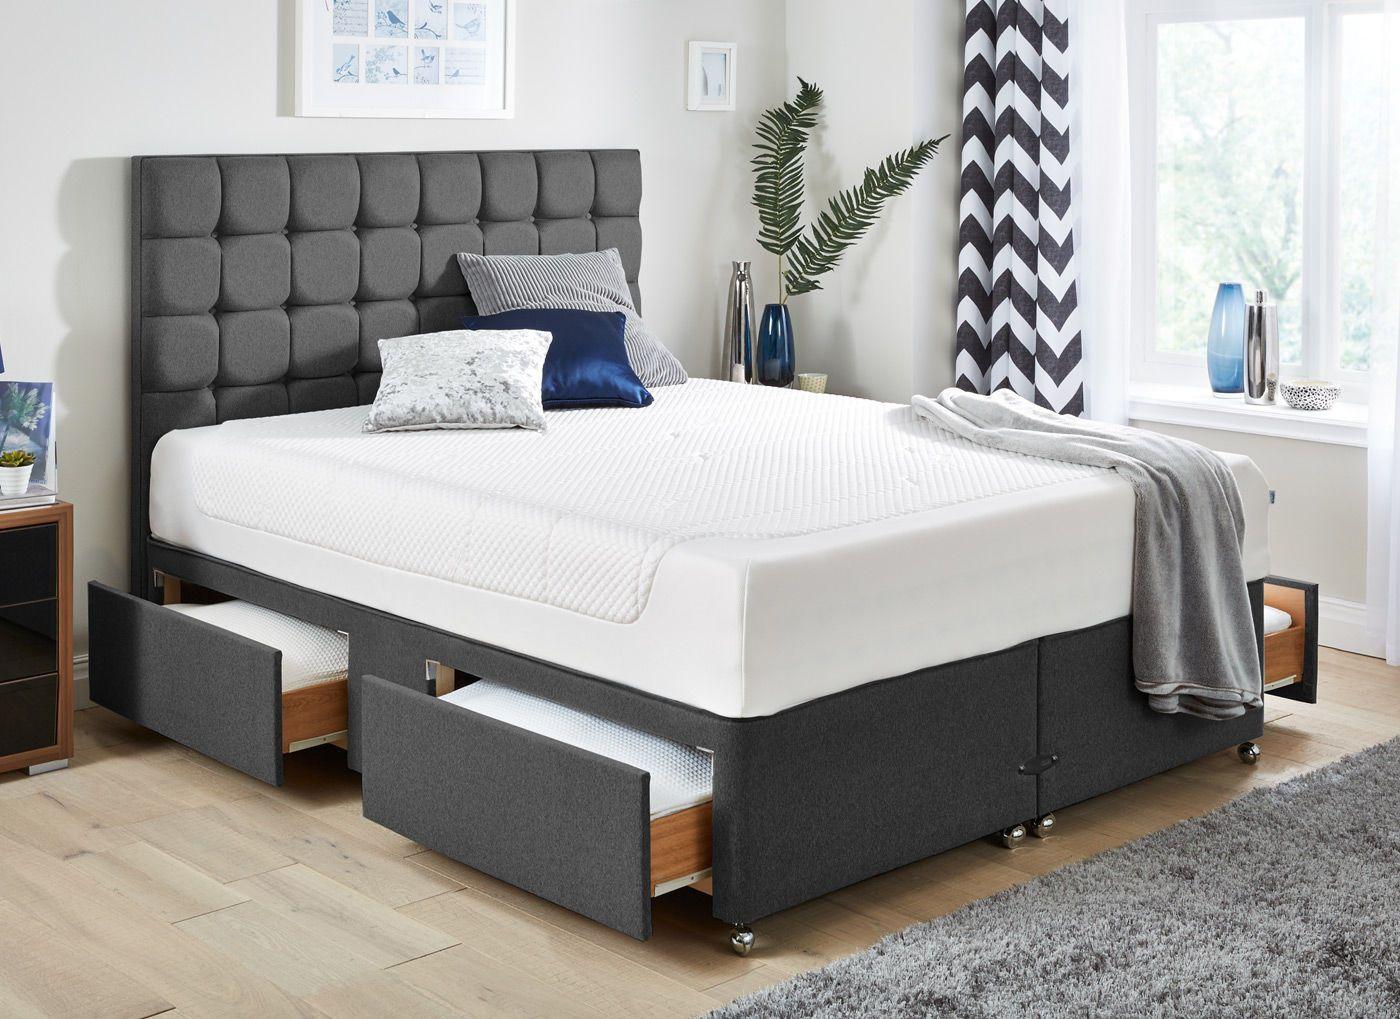 TEMPUR Cloud Deluxe 27 and Luxury Base Divan Bed Dark